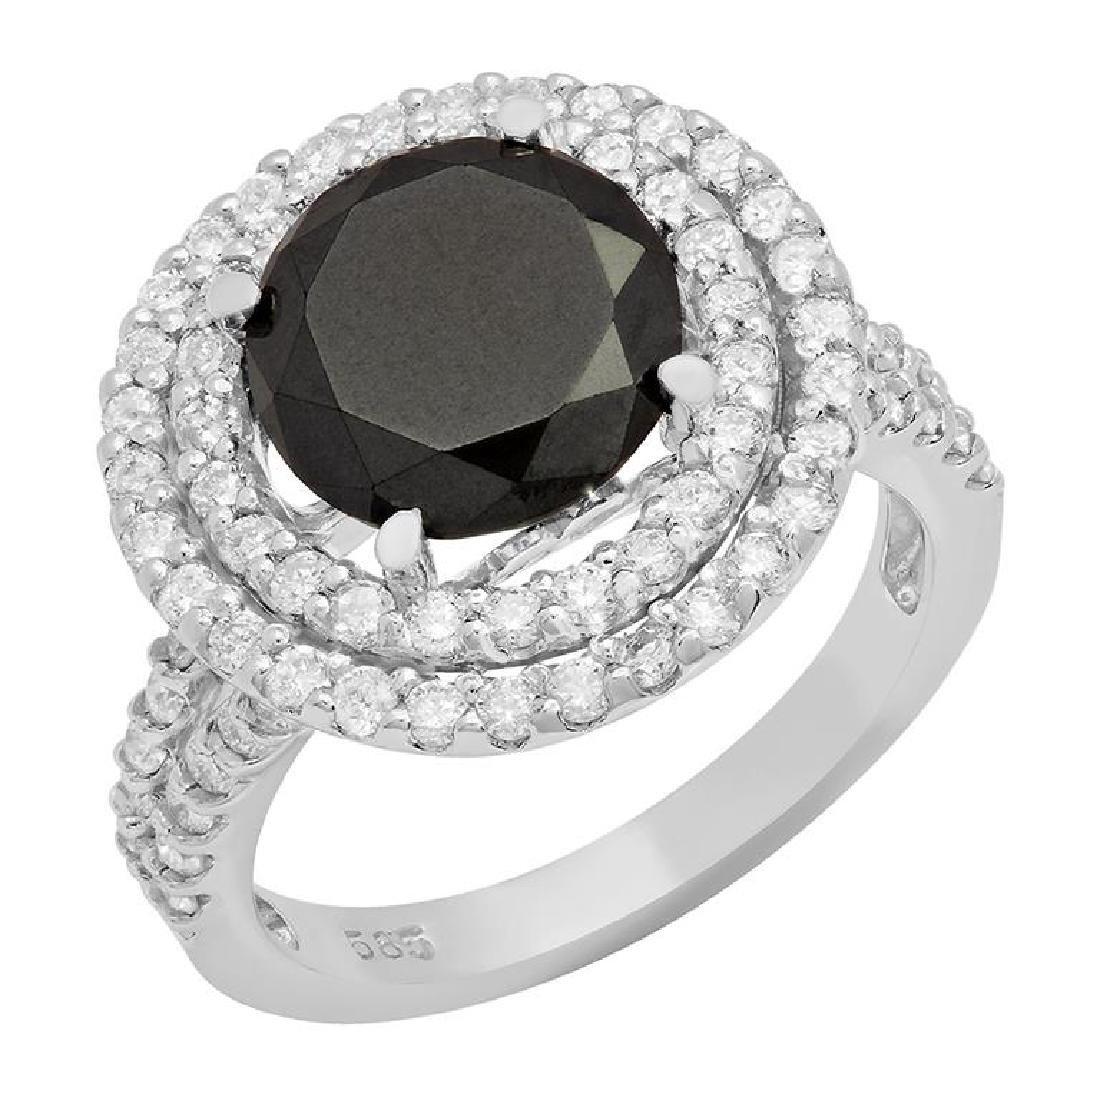 14k White Gold 3.15ct & 1.22ct Diamond Ring